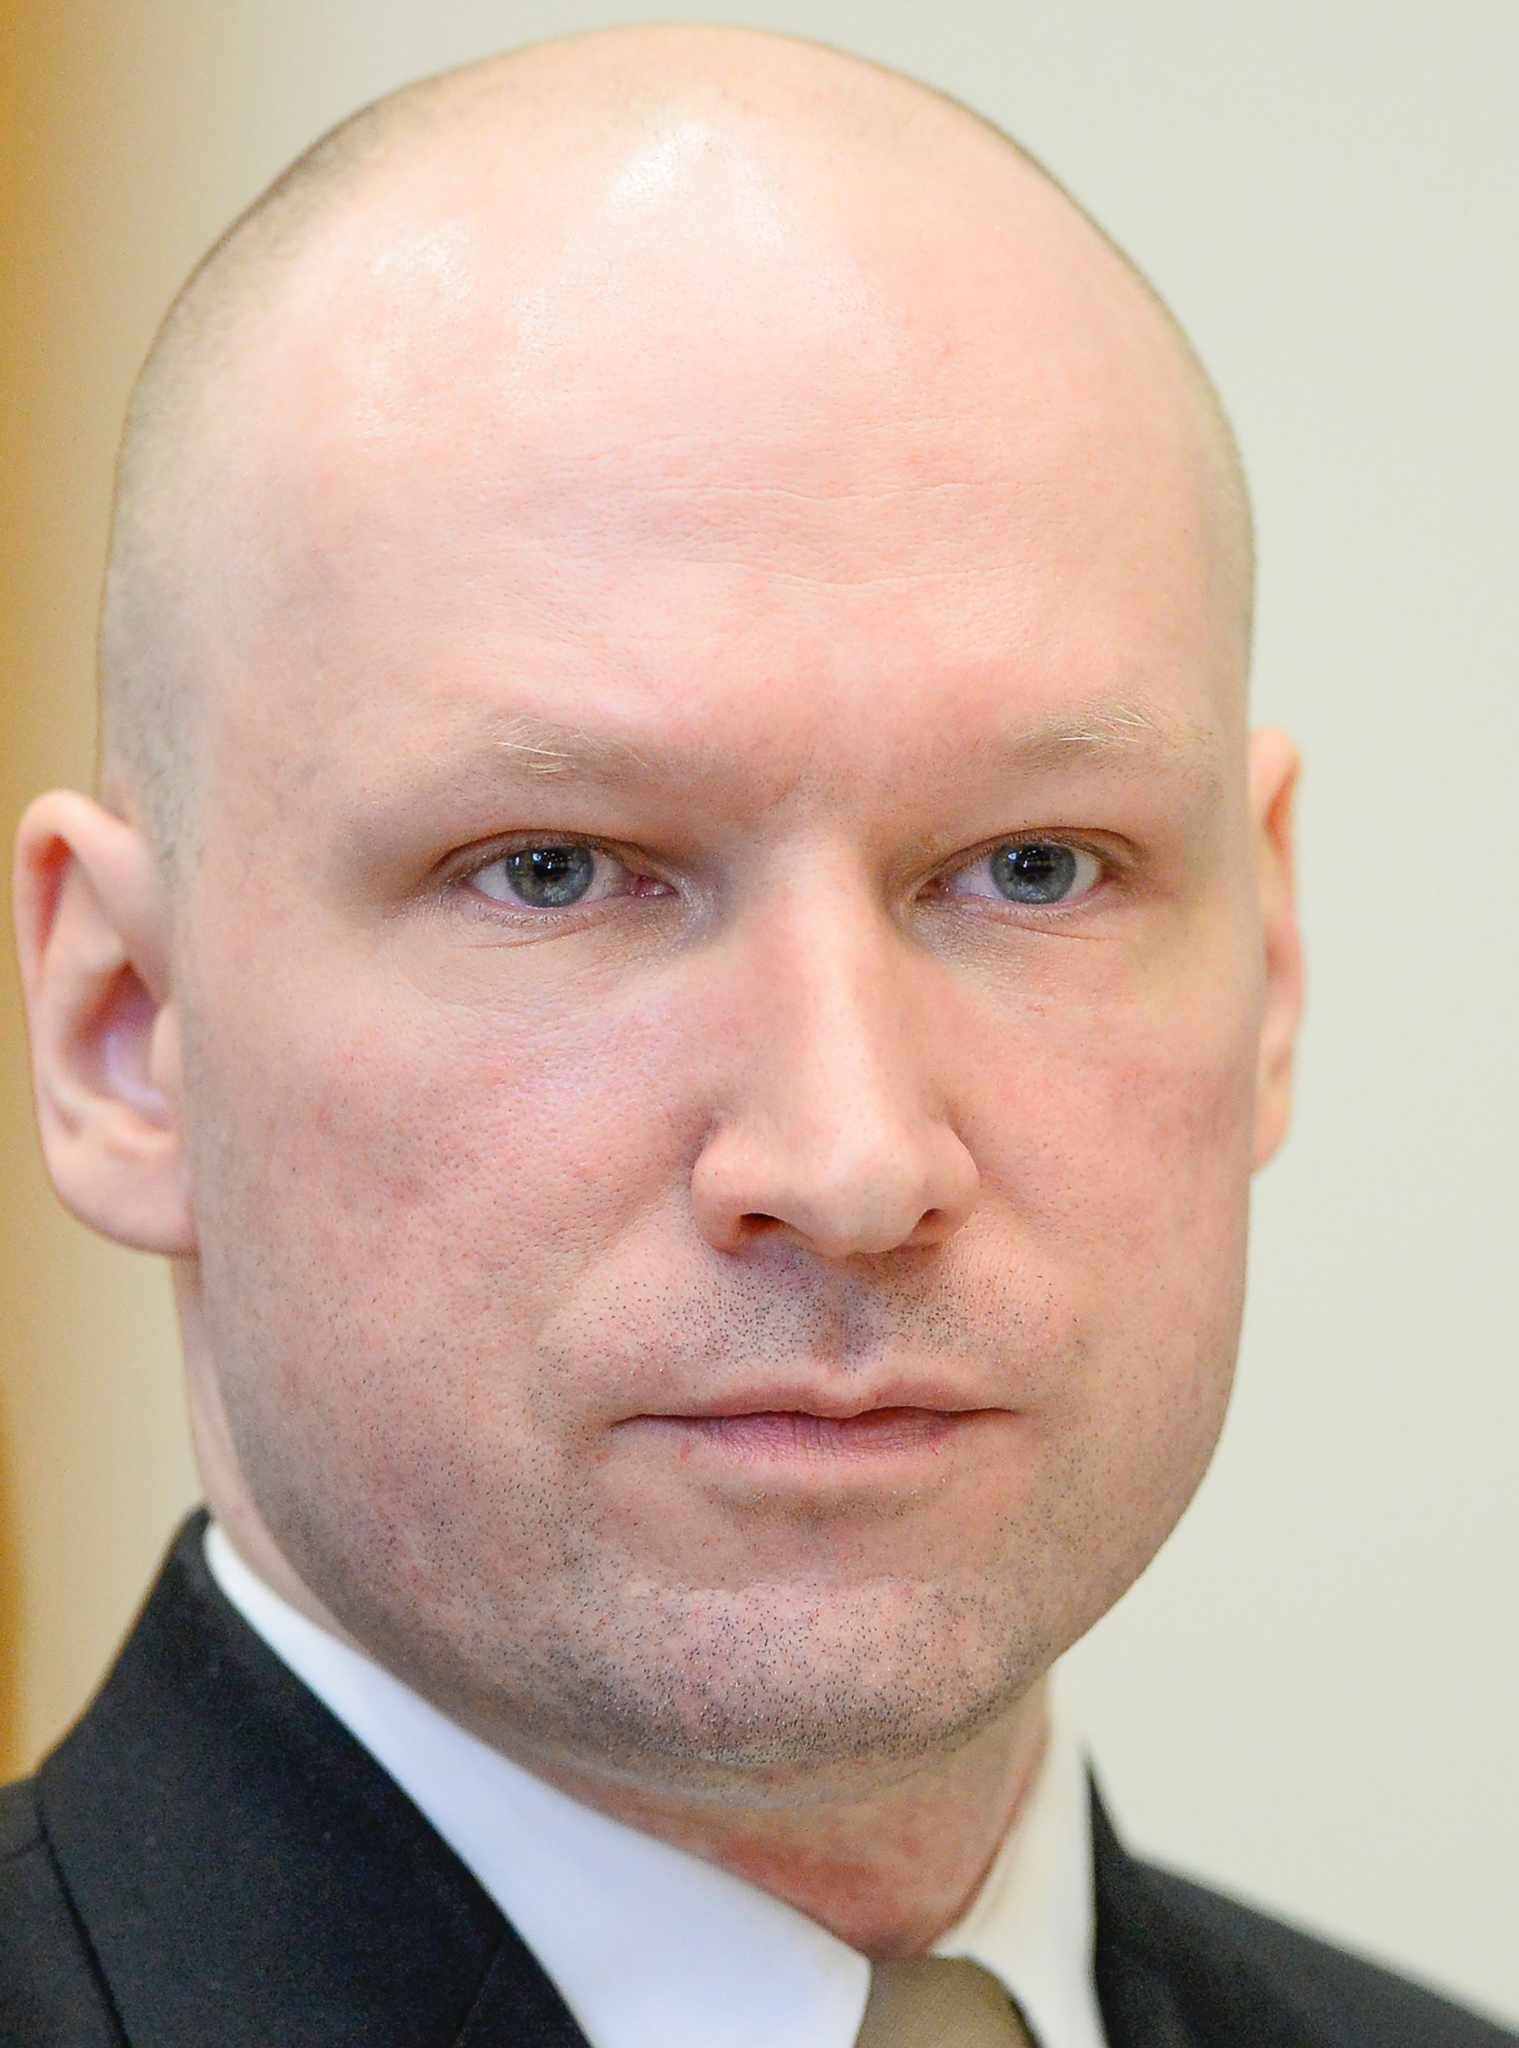 Anders Breivik vermoordde op 22 juli 2011 in Oslo en op het eiland Utoya 77 mensen.